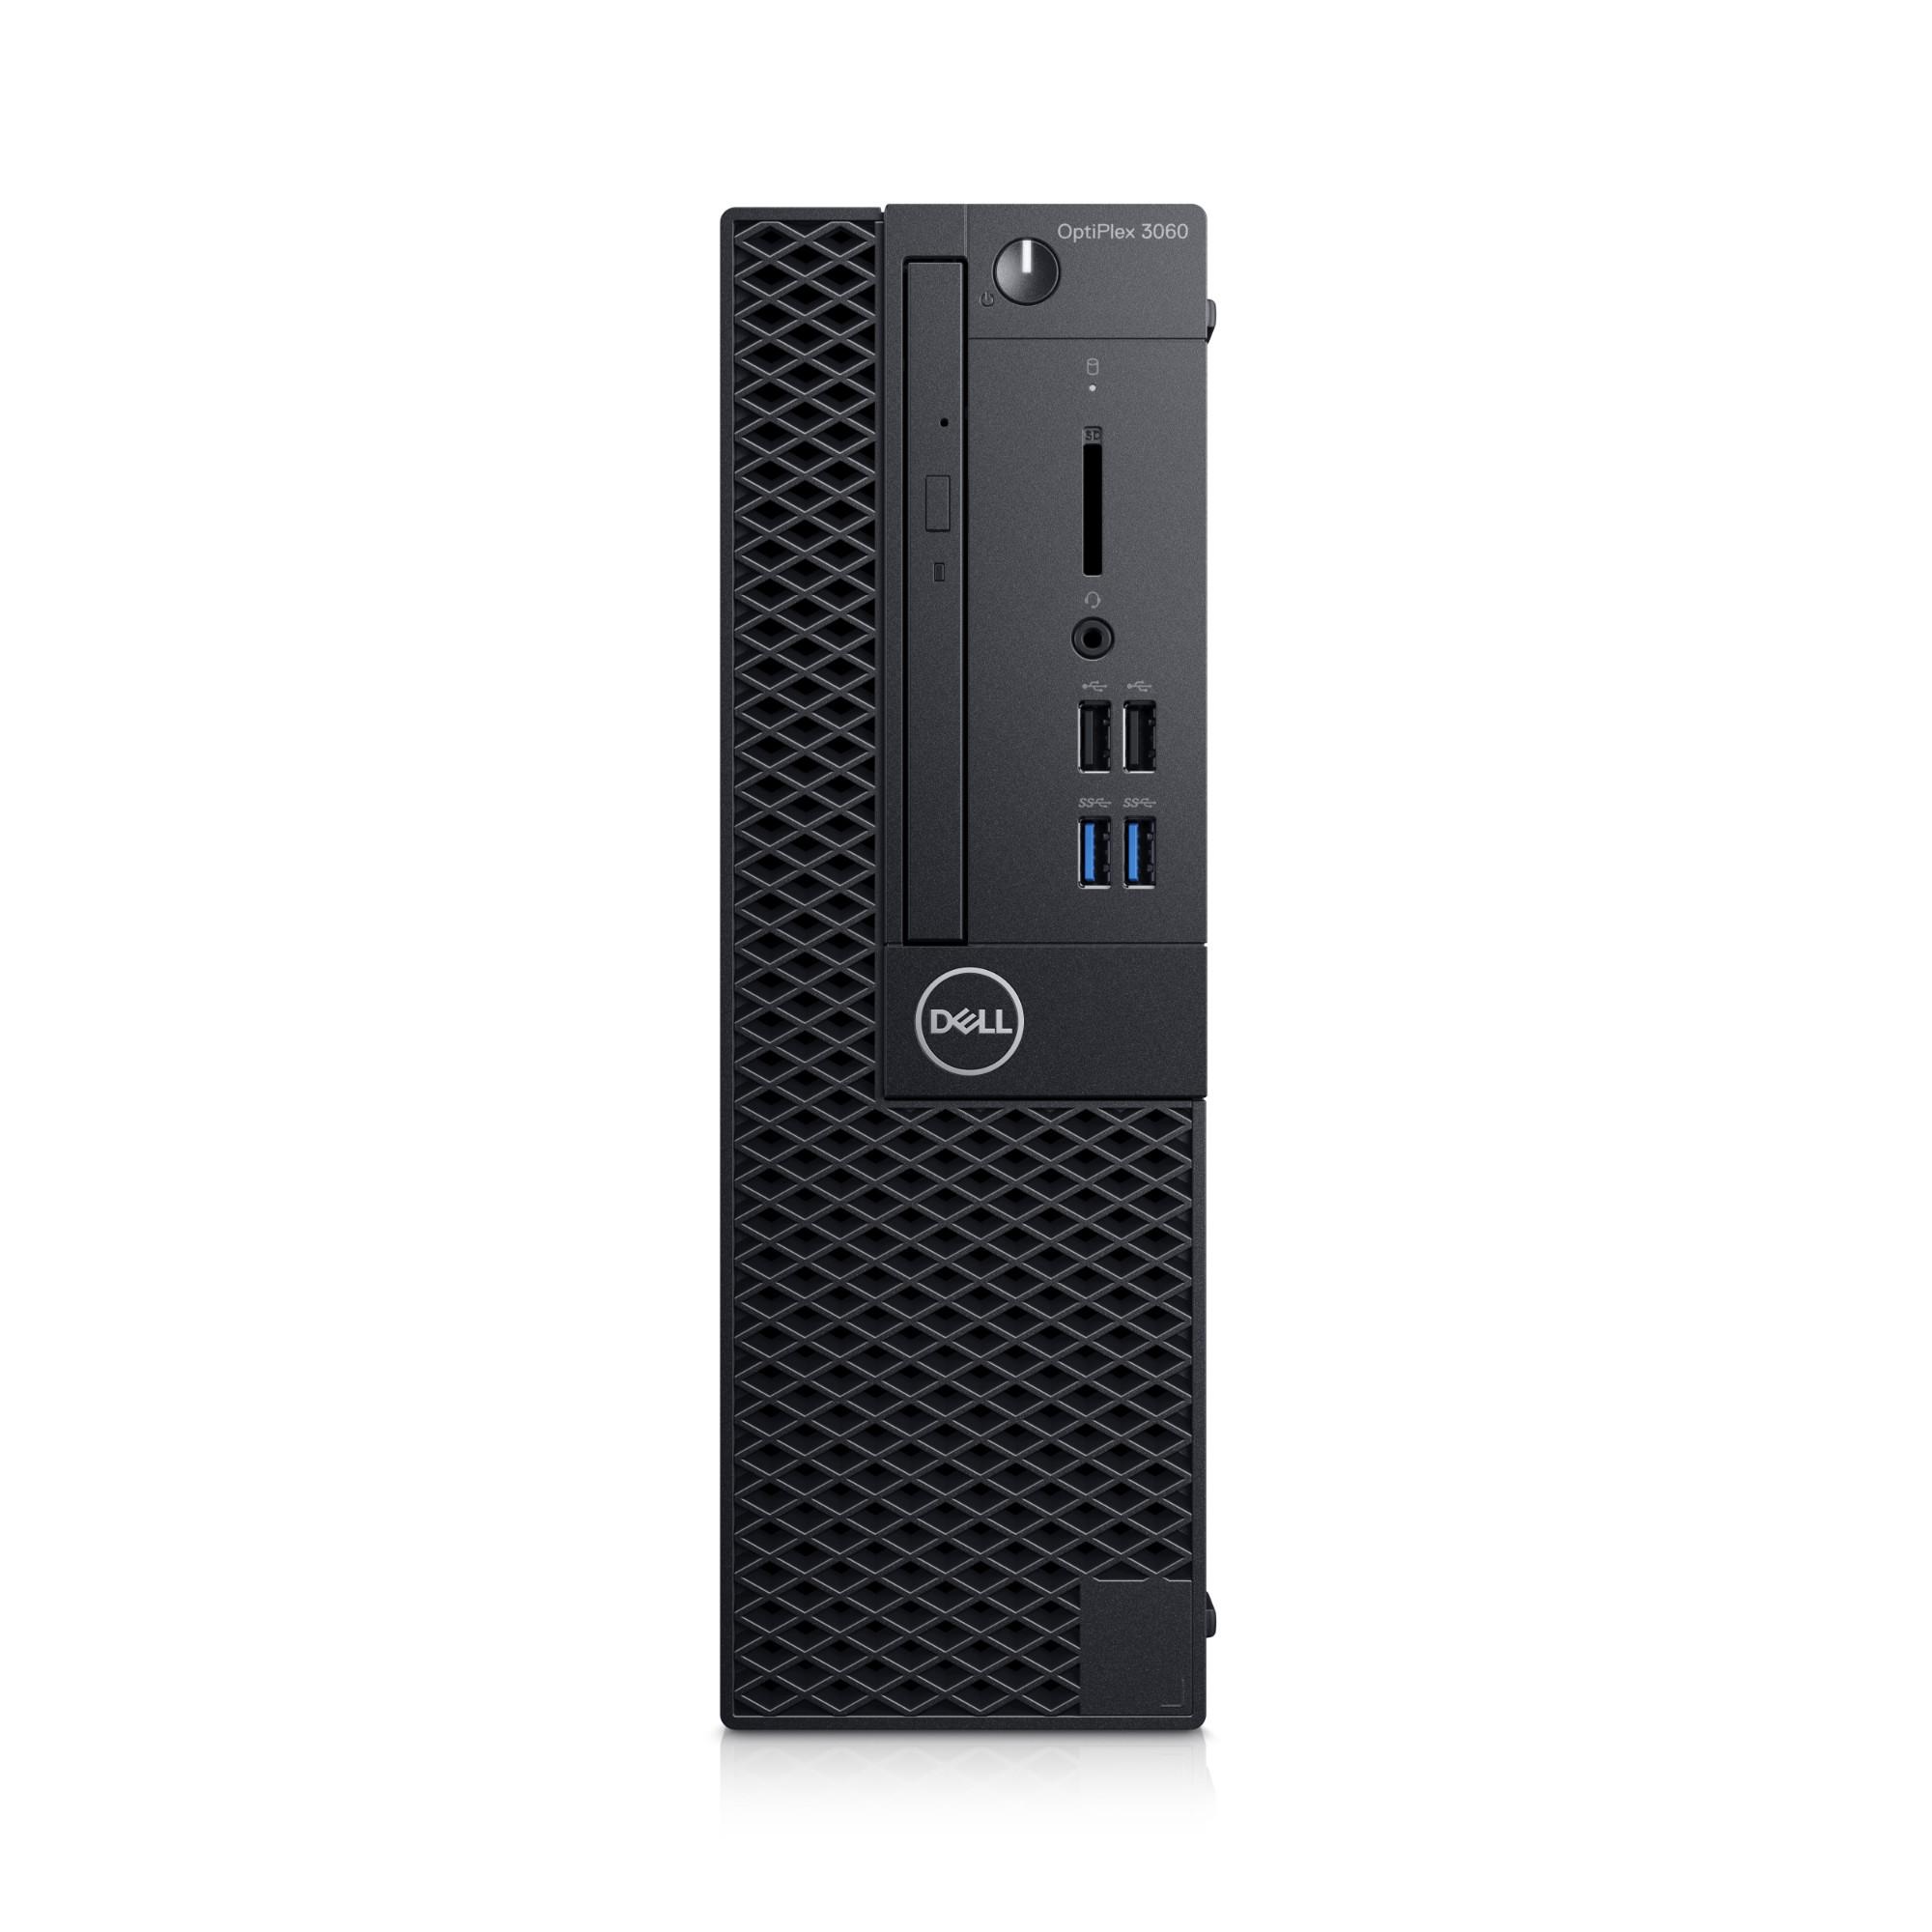 DELL OptiPlex 3060 8th gen Intel® Core™ i5 i5-8500 8 GB DDR4